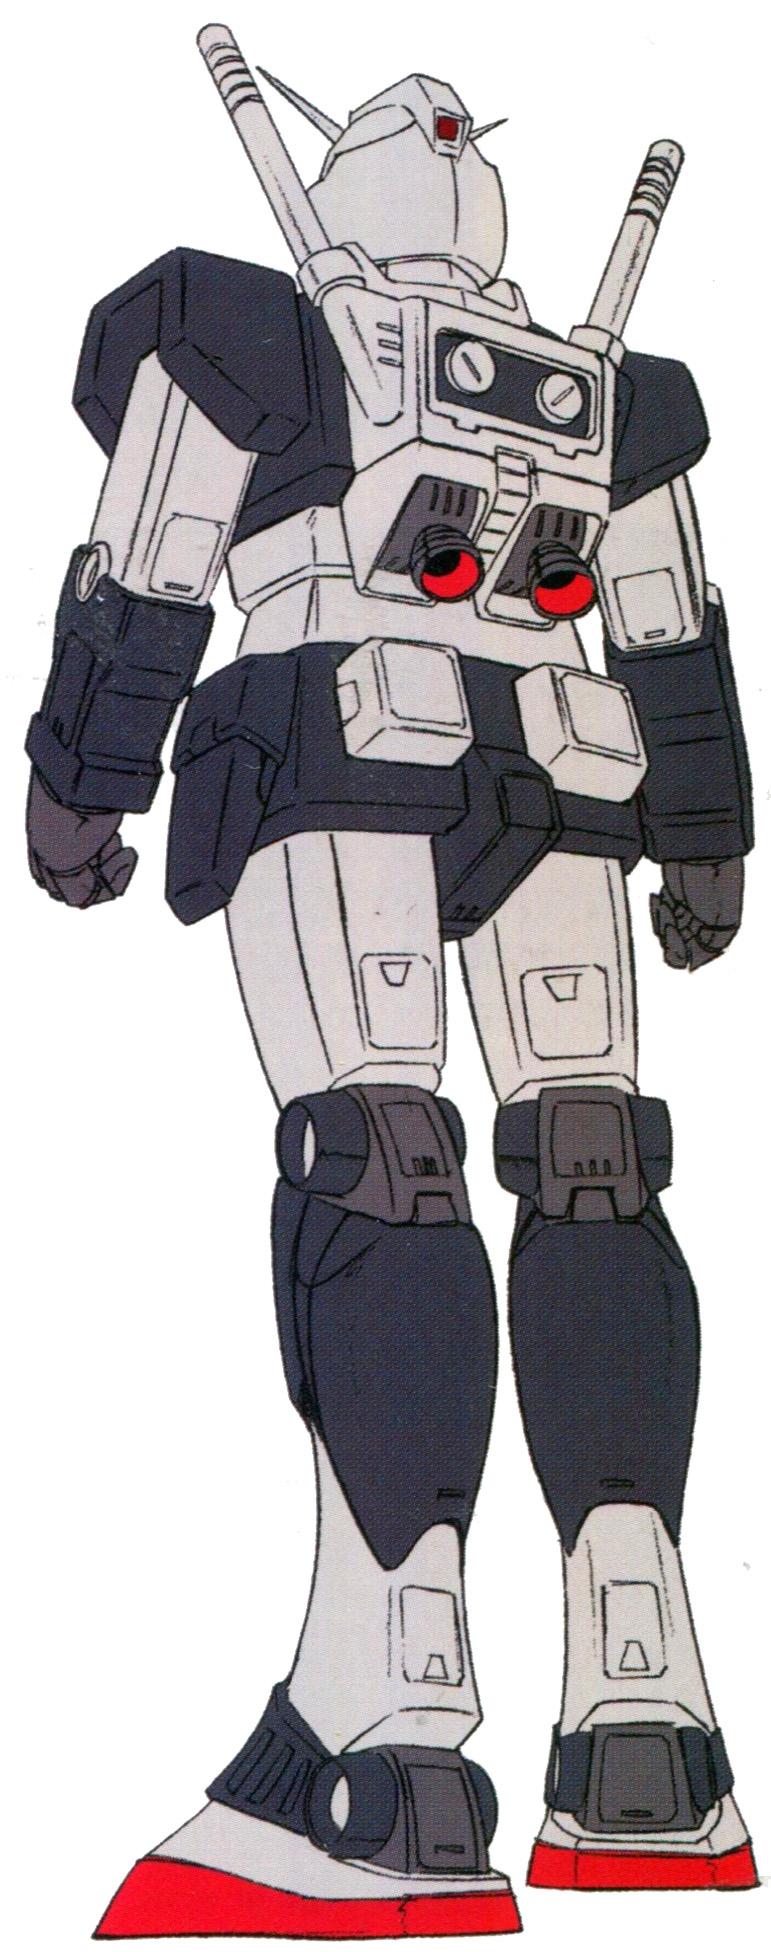 Rx-78-1-back